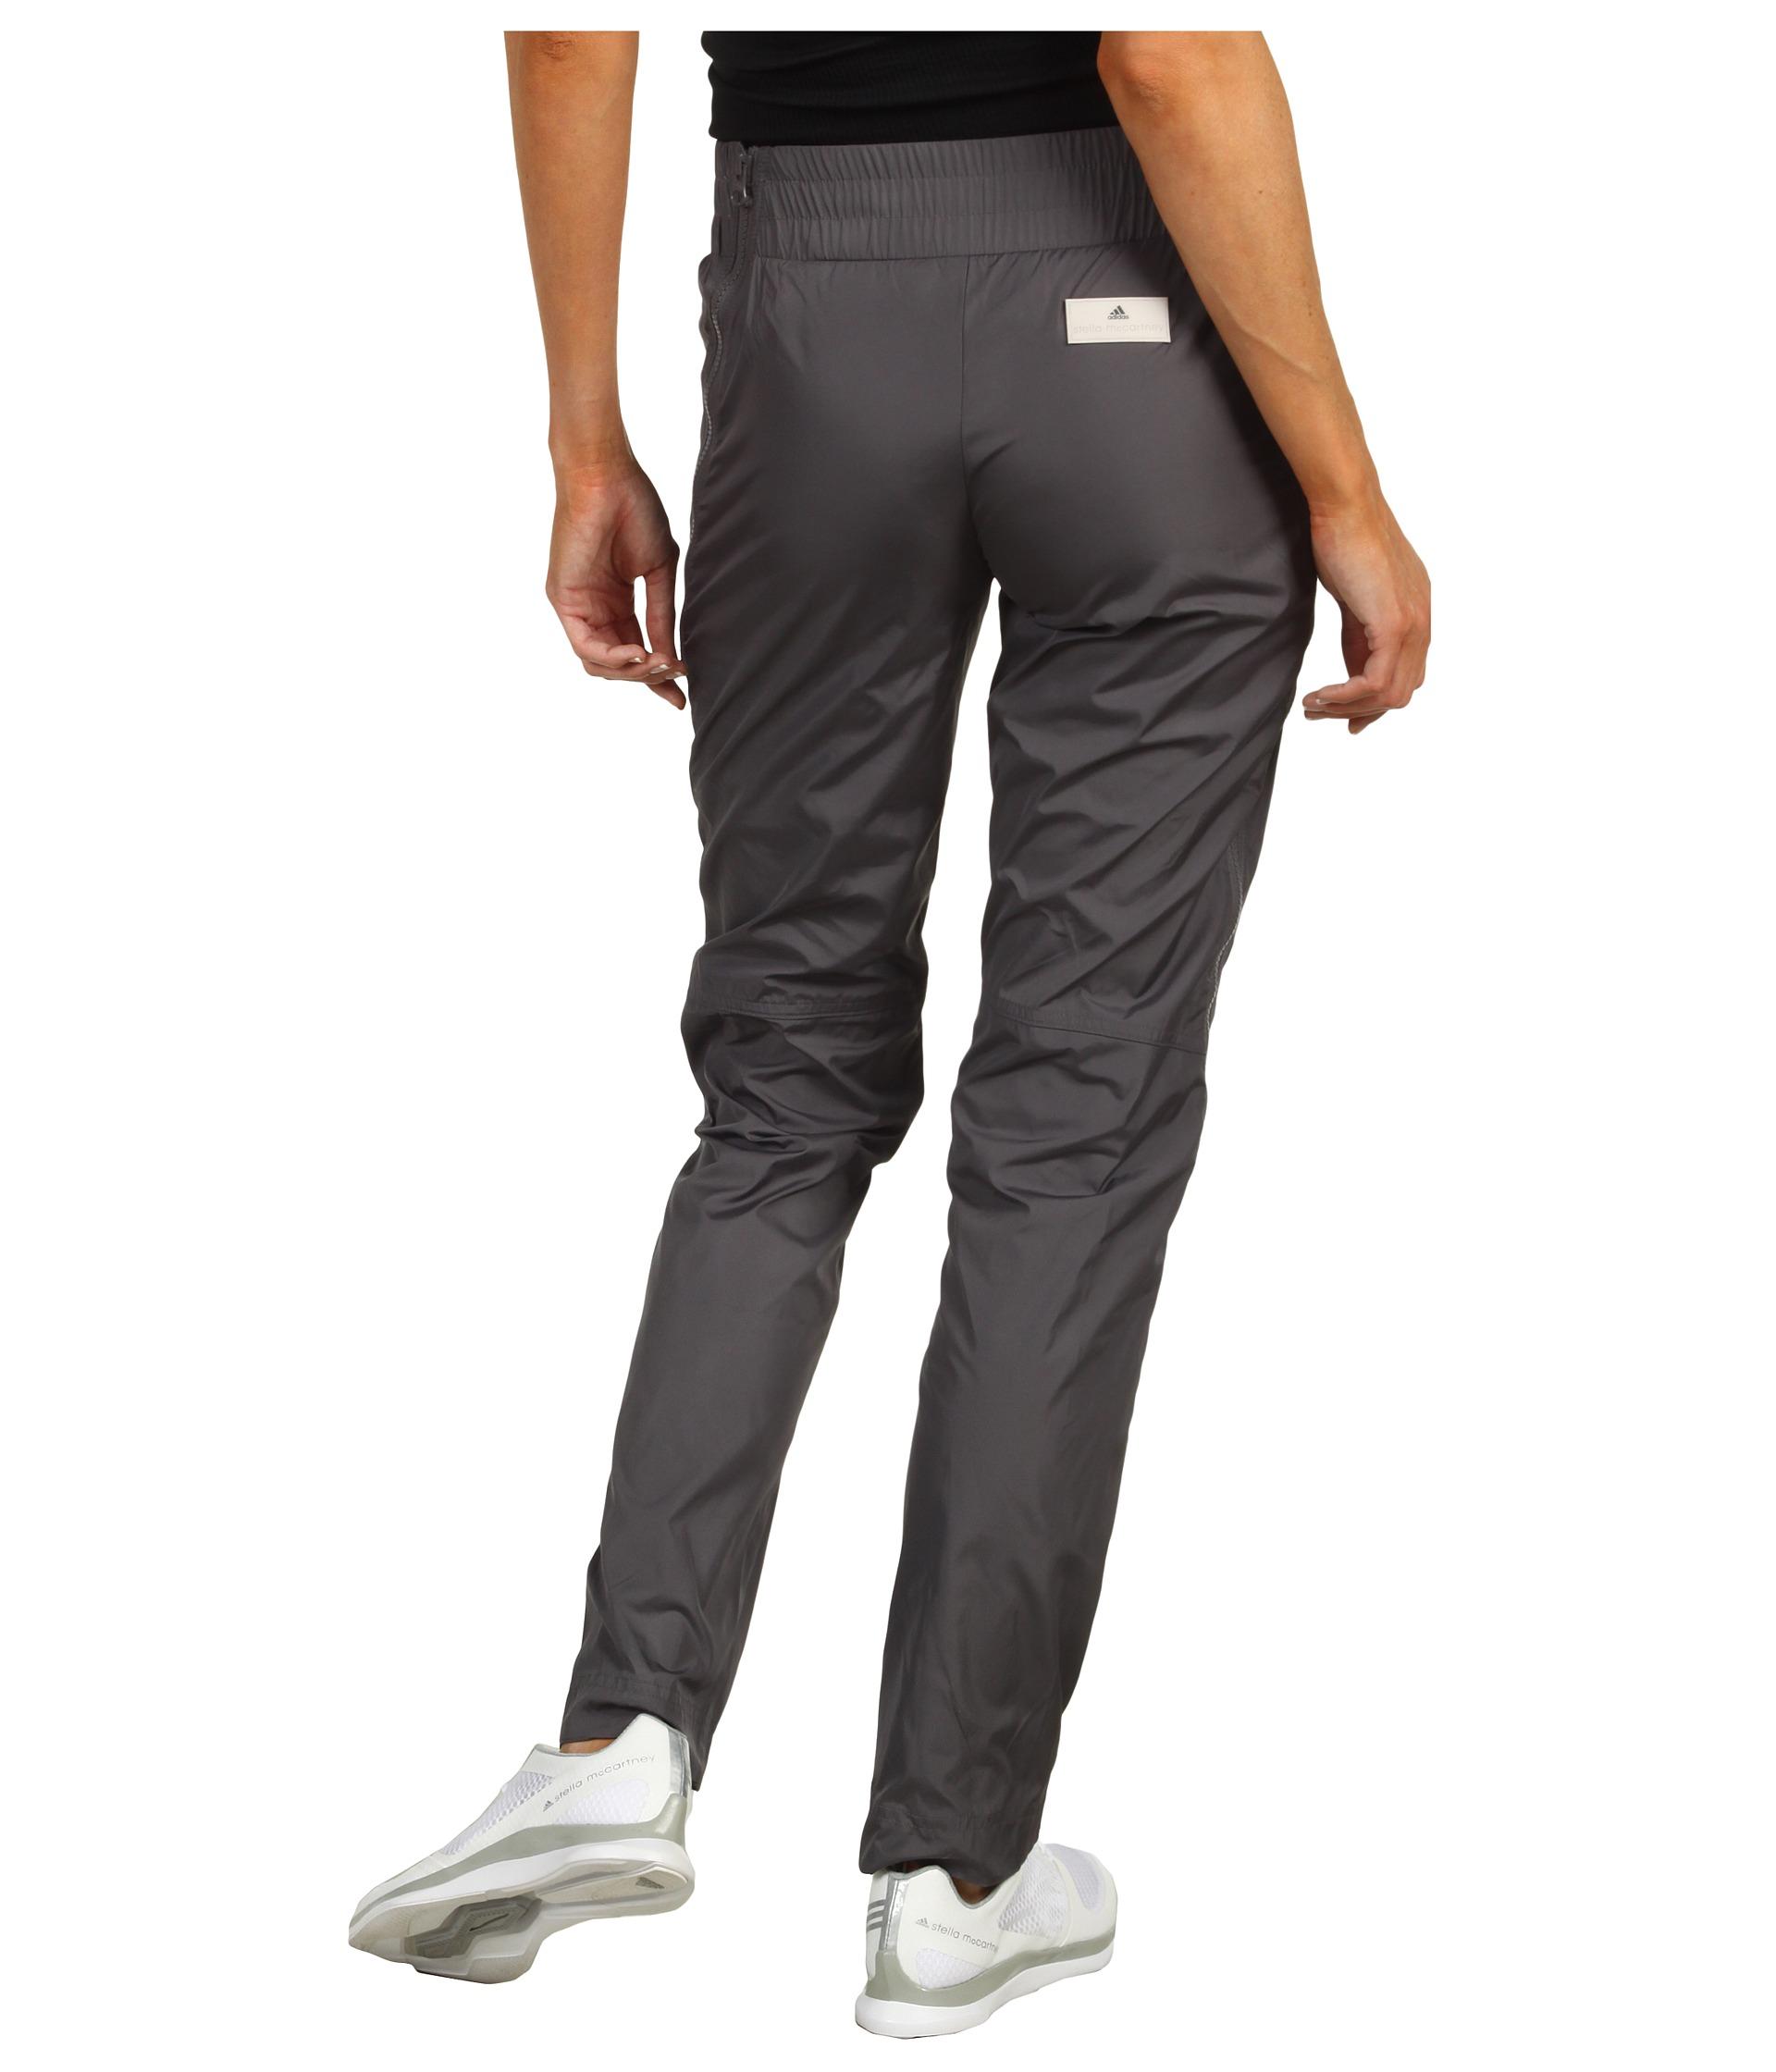 Adidas Stella McCartney Studio Woven Pants Back View